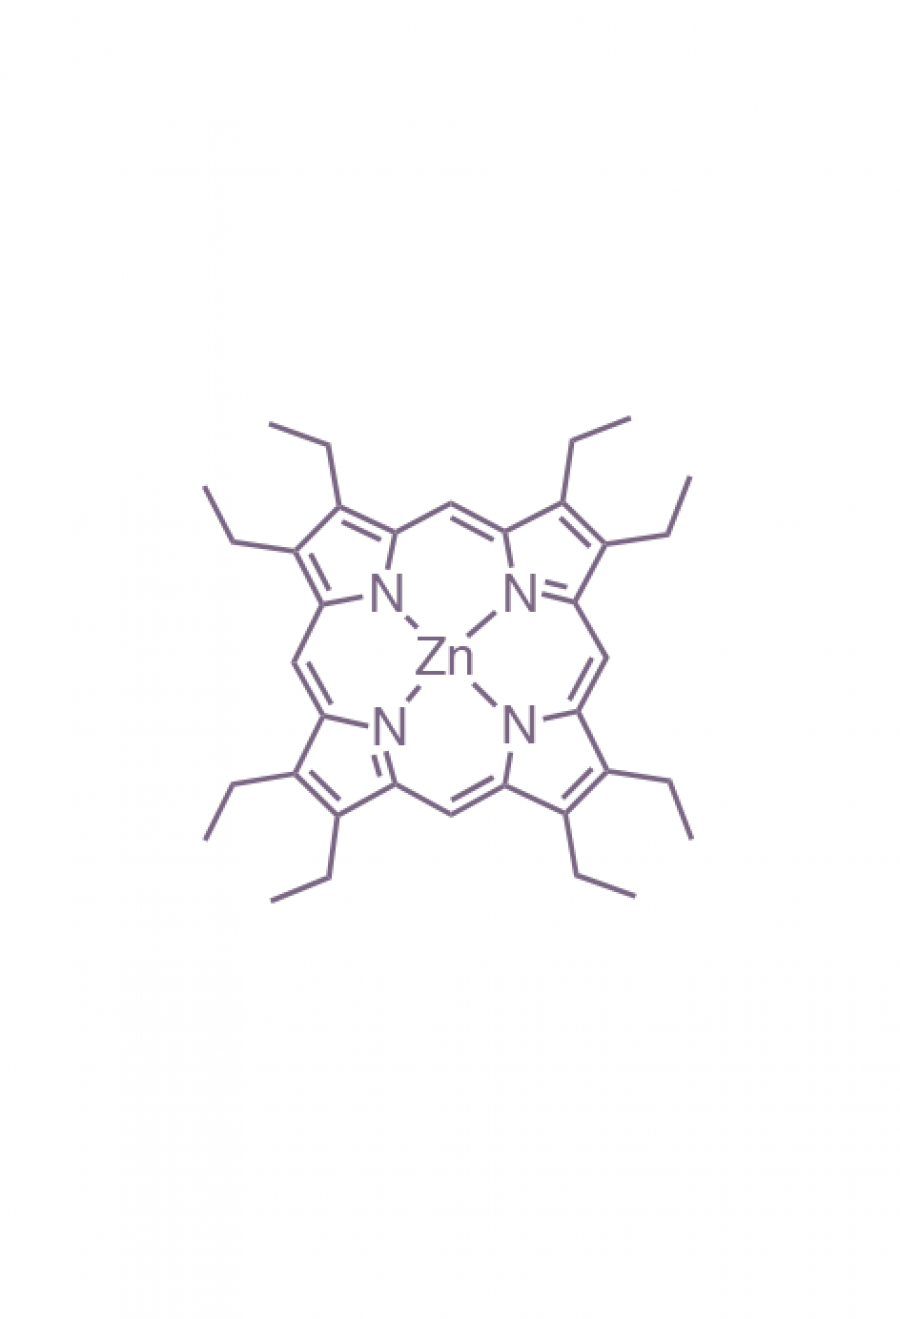 zinc(II) 2,3,7,8,12,13,17,18-(octaethyl)porphyrin